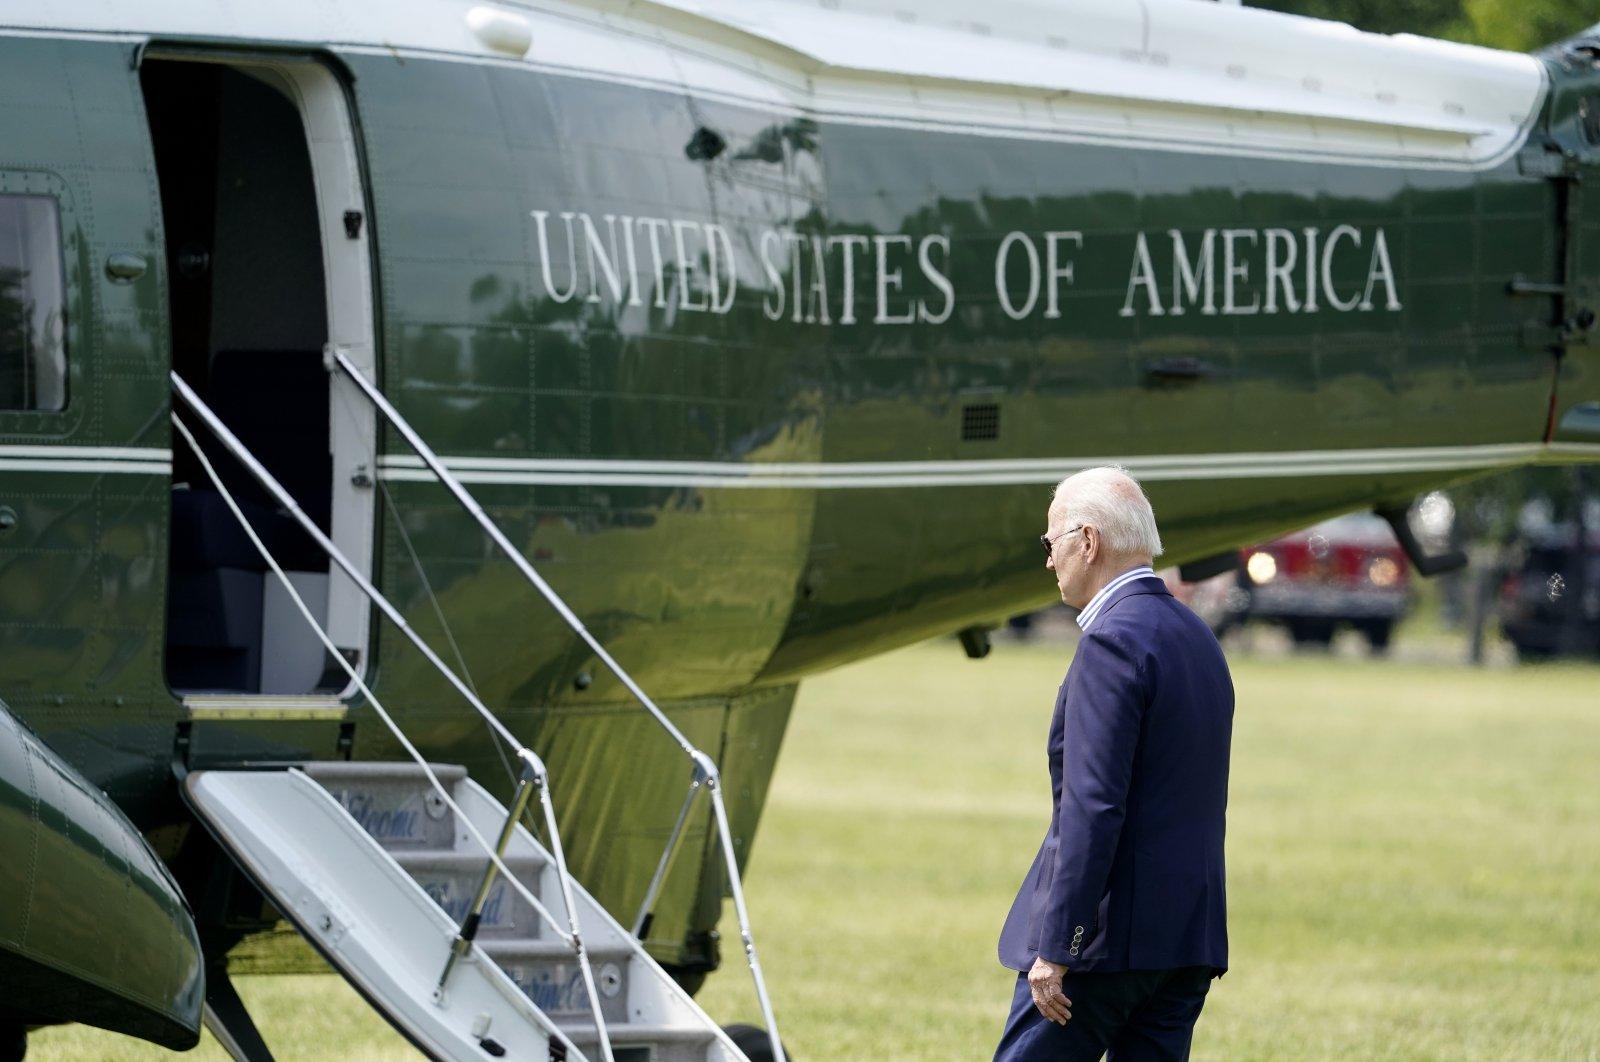 President Joe Biden walks to Marine One upon departure from the Ellipse at the White House, Washington, May 22, 2021. (AP Photo/Alex Brandon)